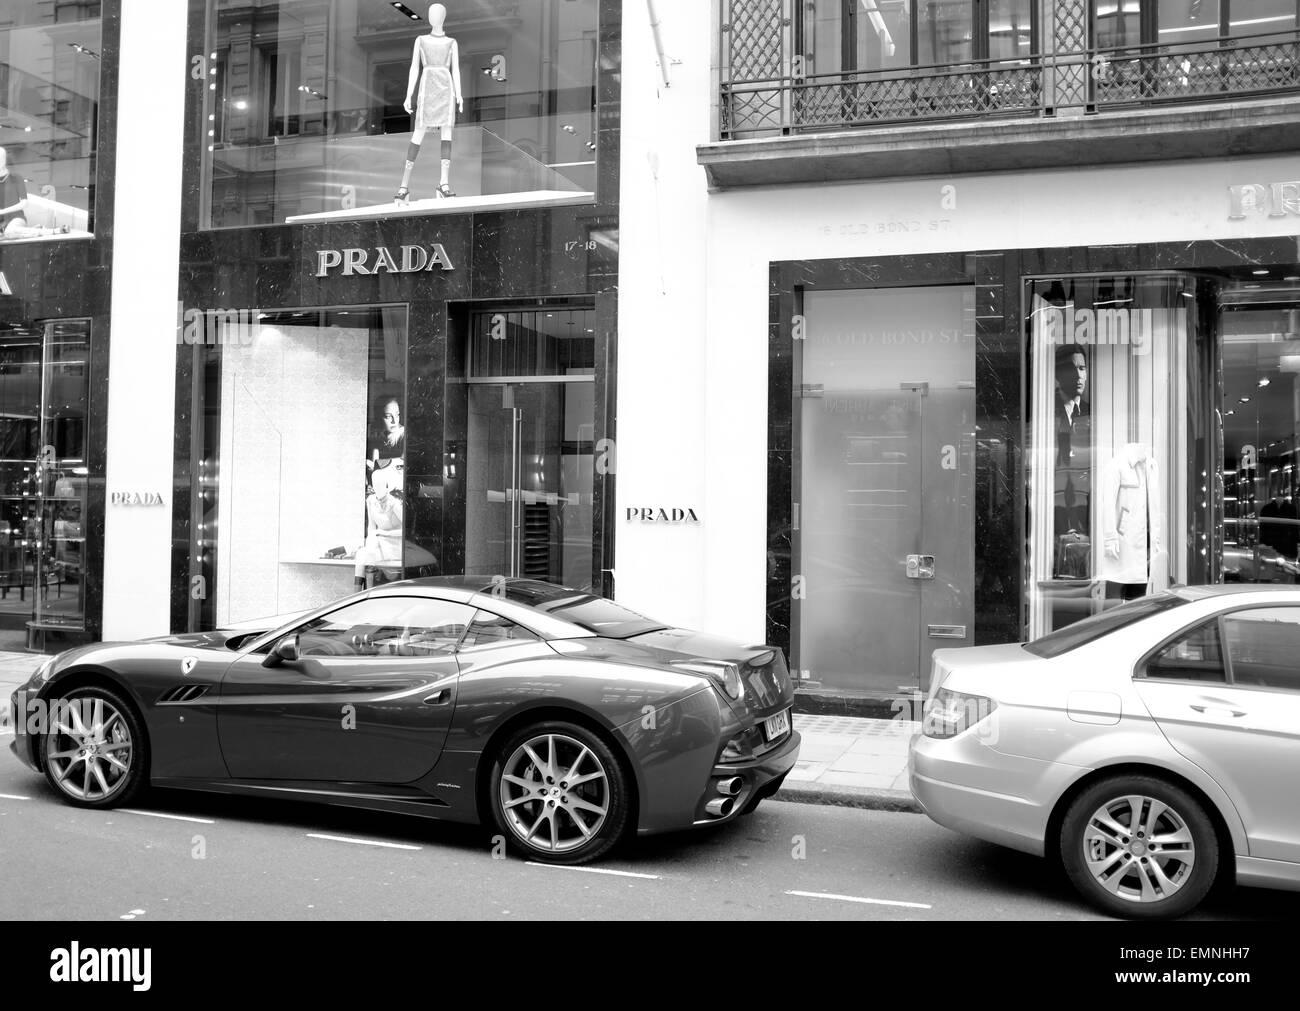 Ferrari California parked in Old Bond Street, London Stock Photo